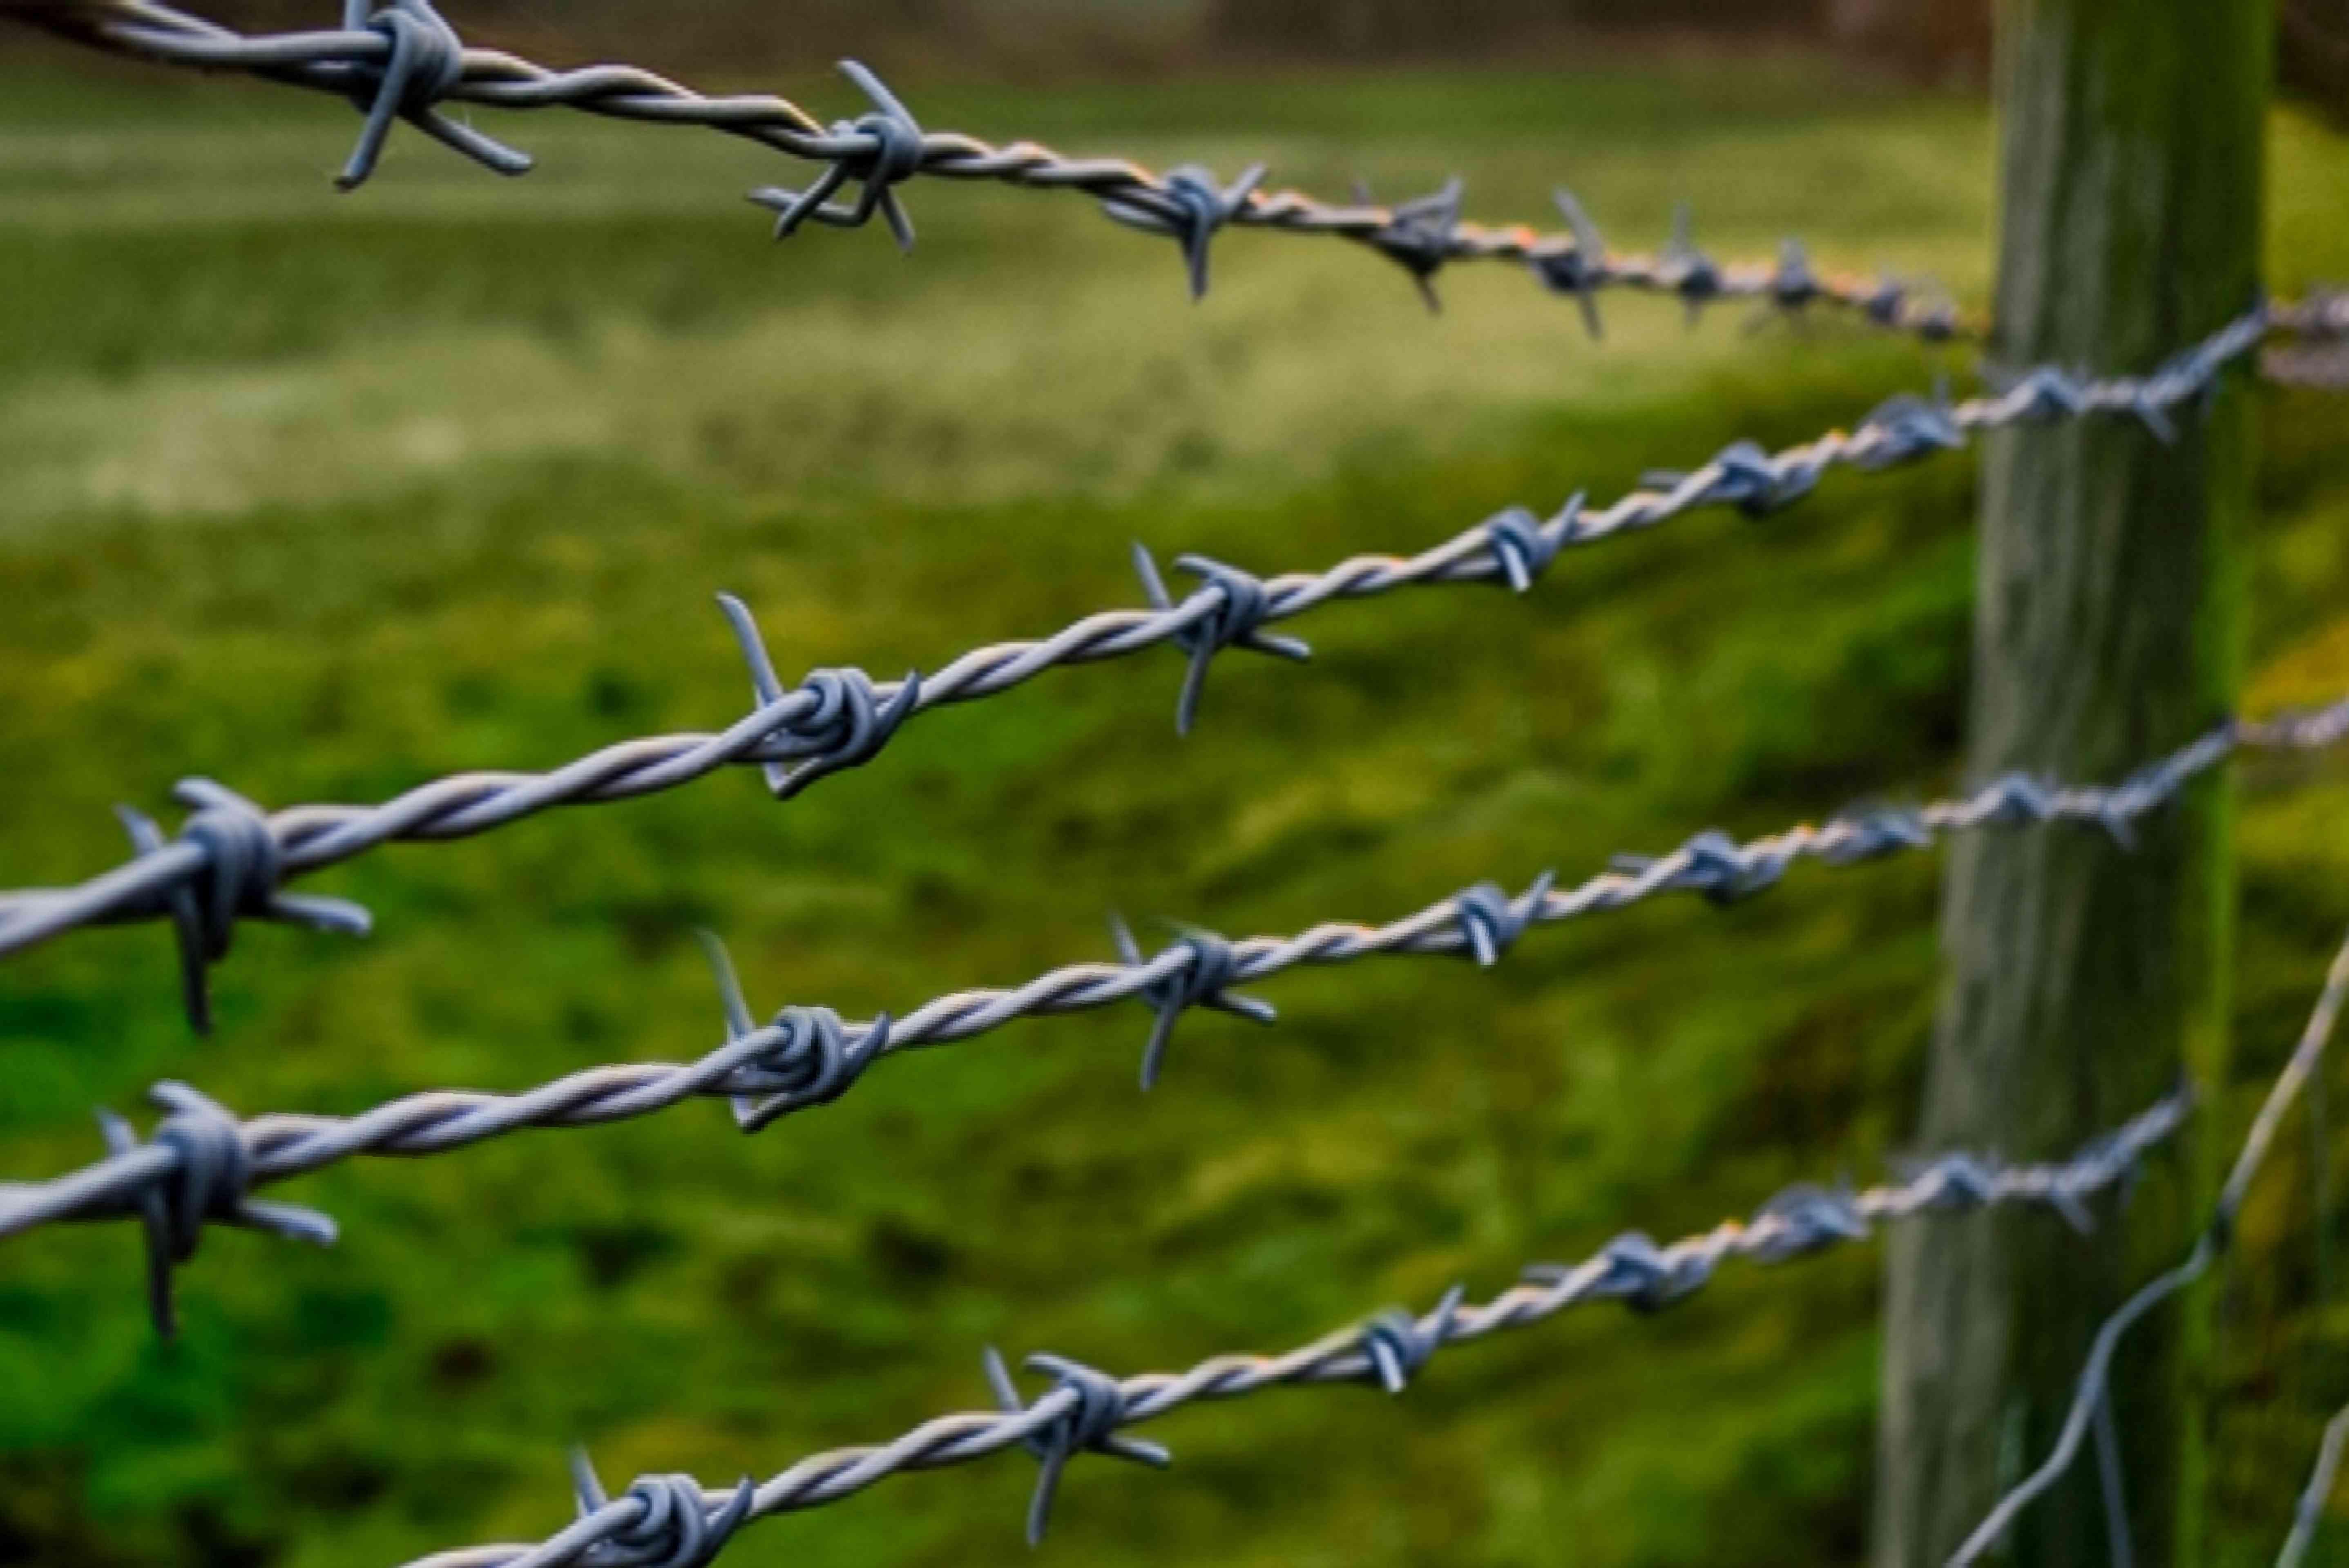 fencing can keep garden pests away